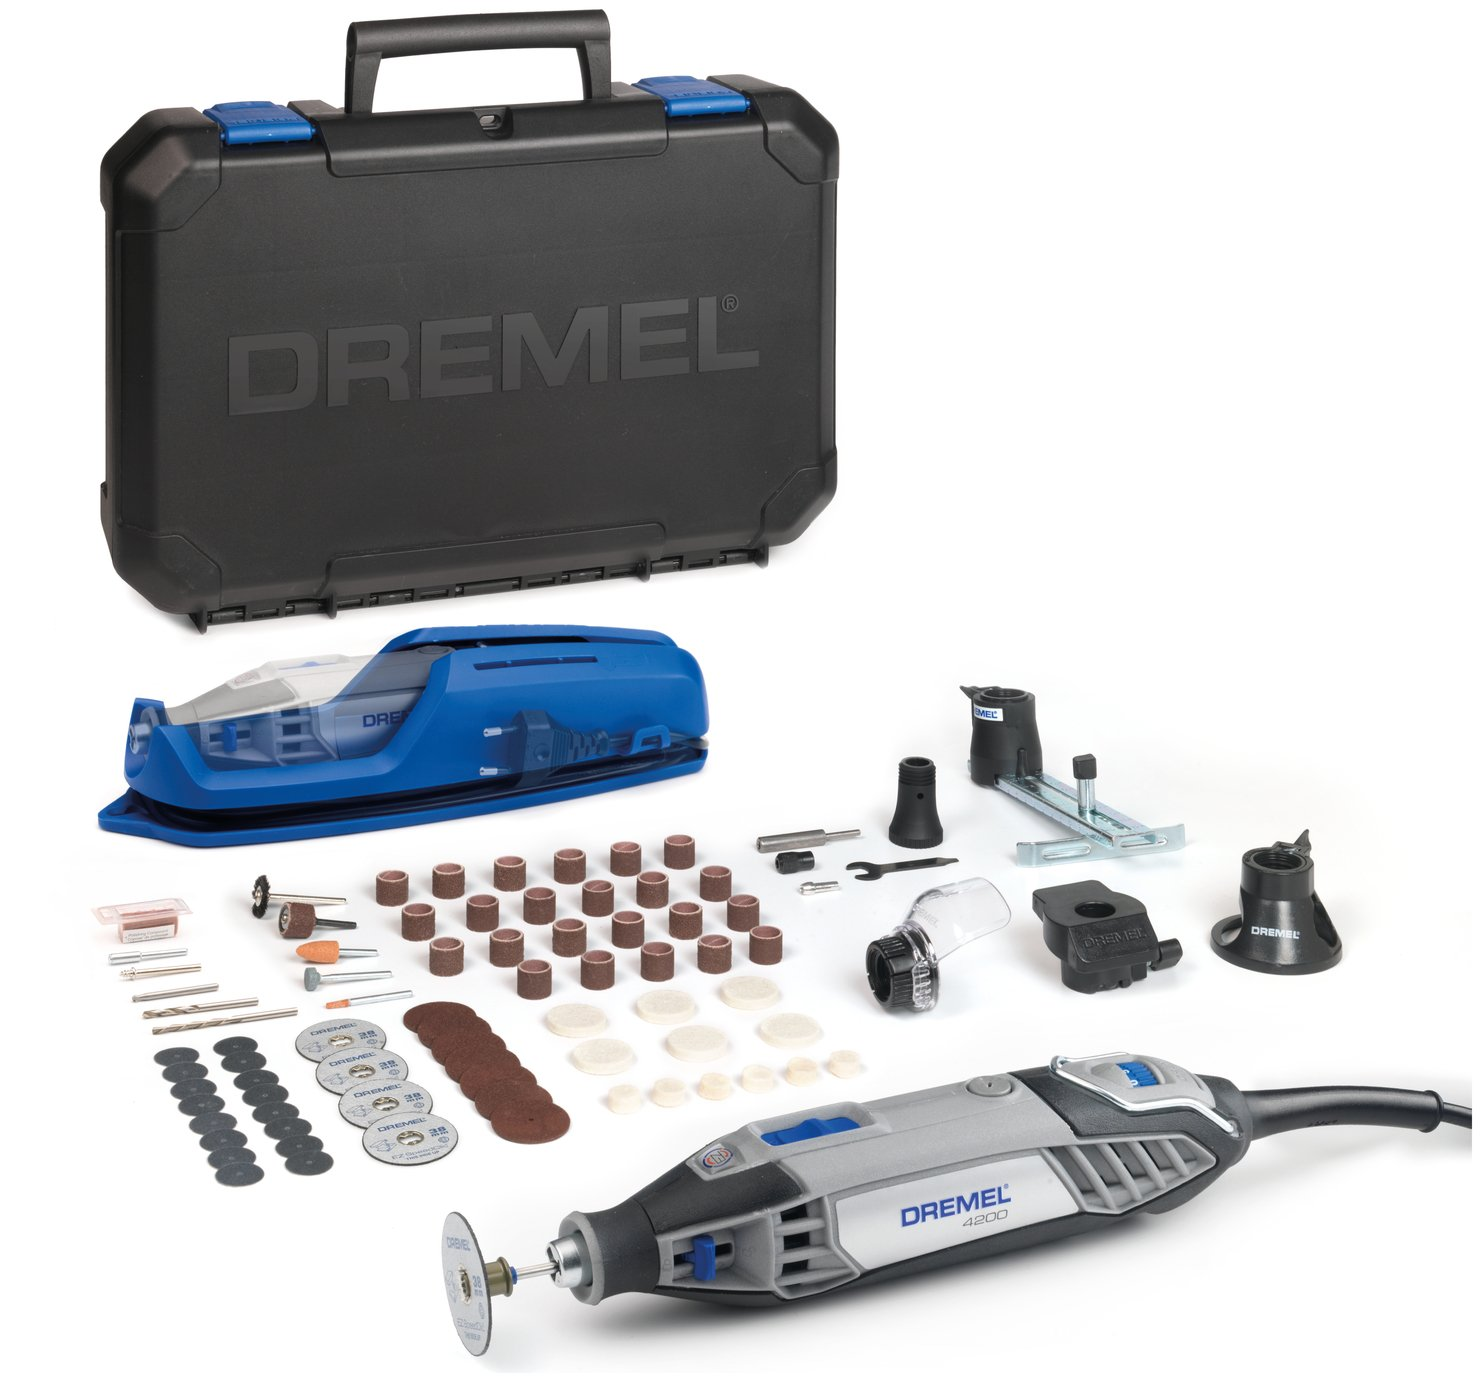 Image of Dremel 4200 EZ Multi-tool